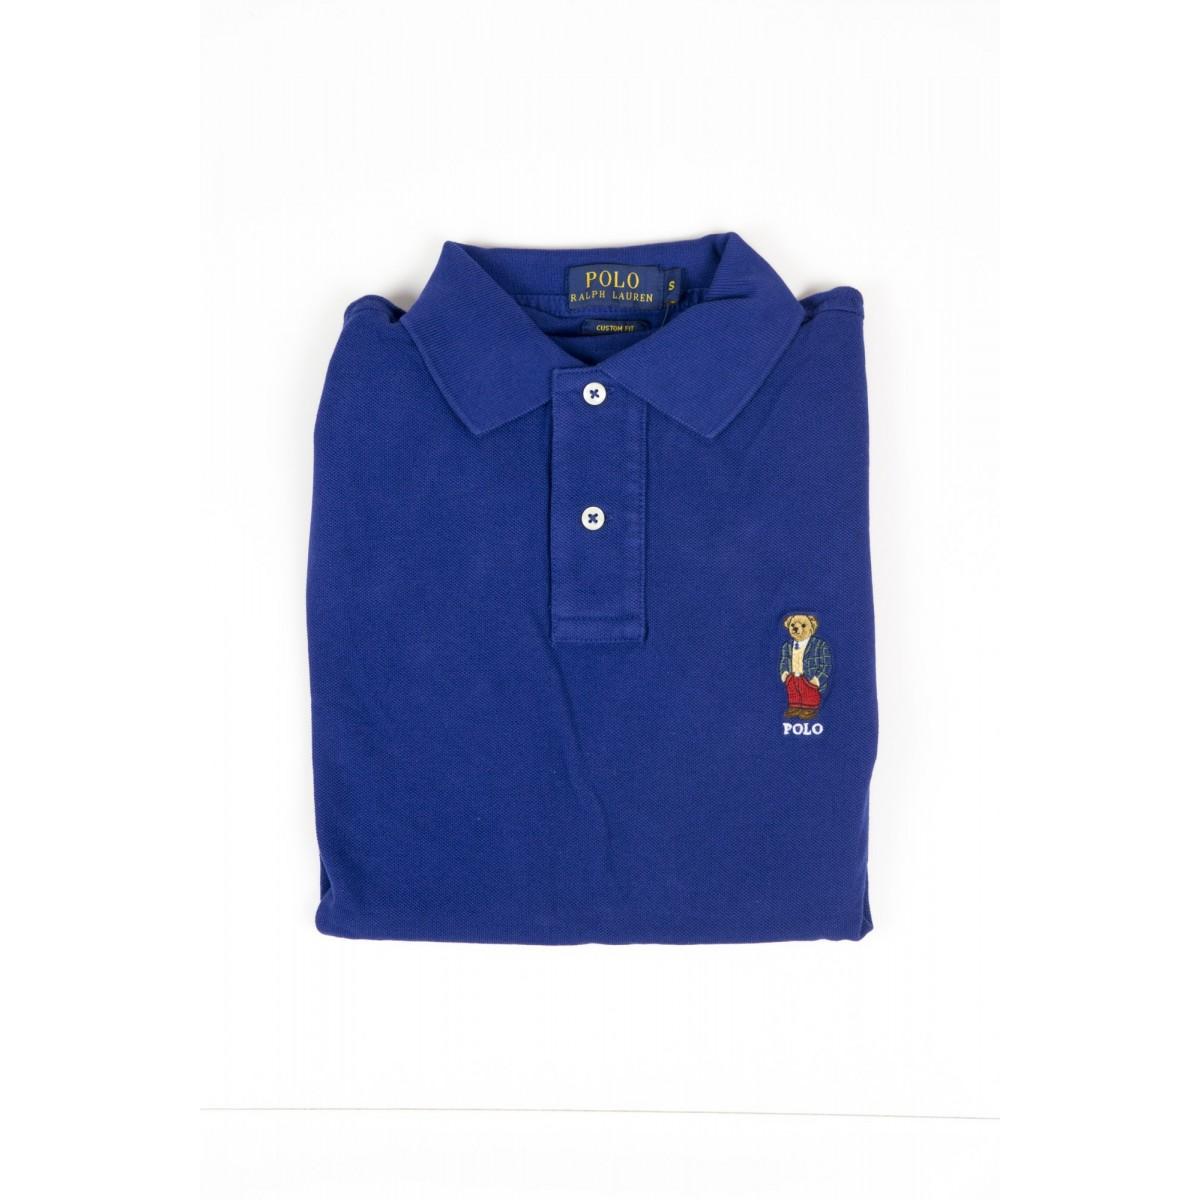 Polo Ralph Lauren Man- A12Kj646C8312 A497H - BLU